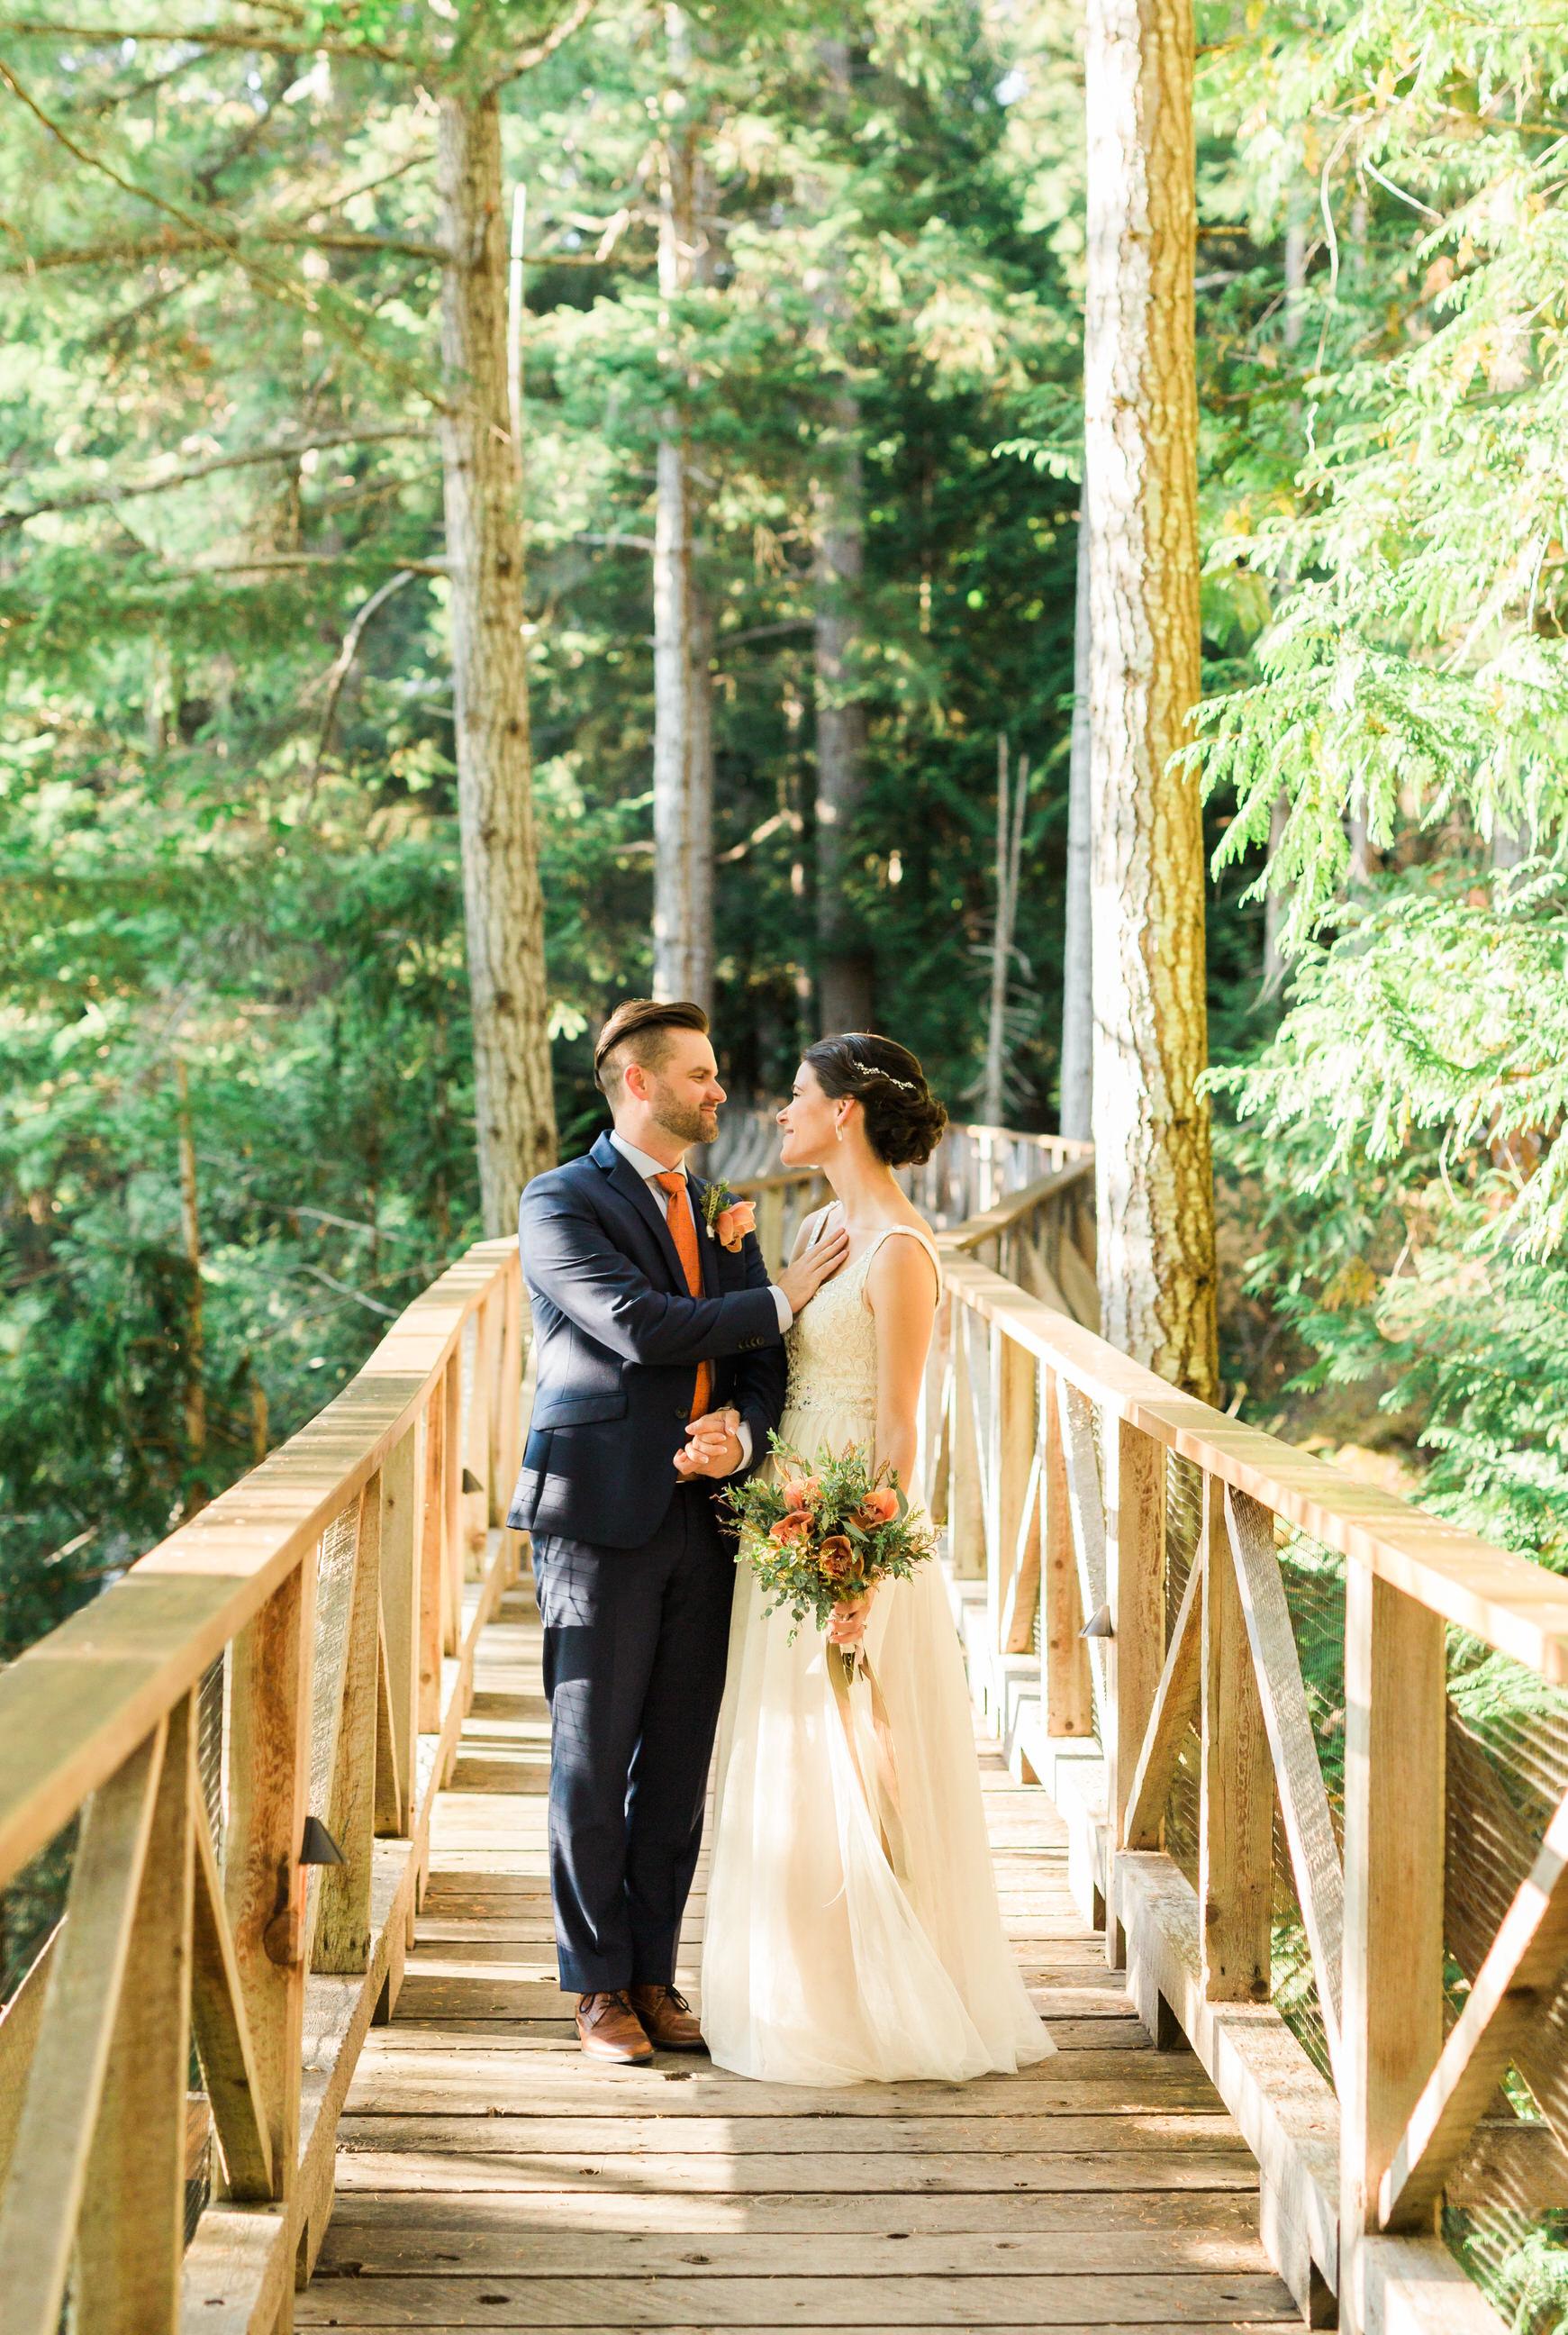 Rockwater Secret Cove Resort Wedding - Sunshine Coast BC Wedding Photographer - Vancouver Wedding Photographer - Sunshine Coast Elopement Photos - IMG_0926.jpg